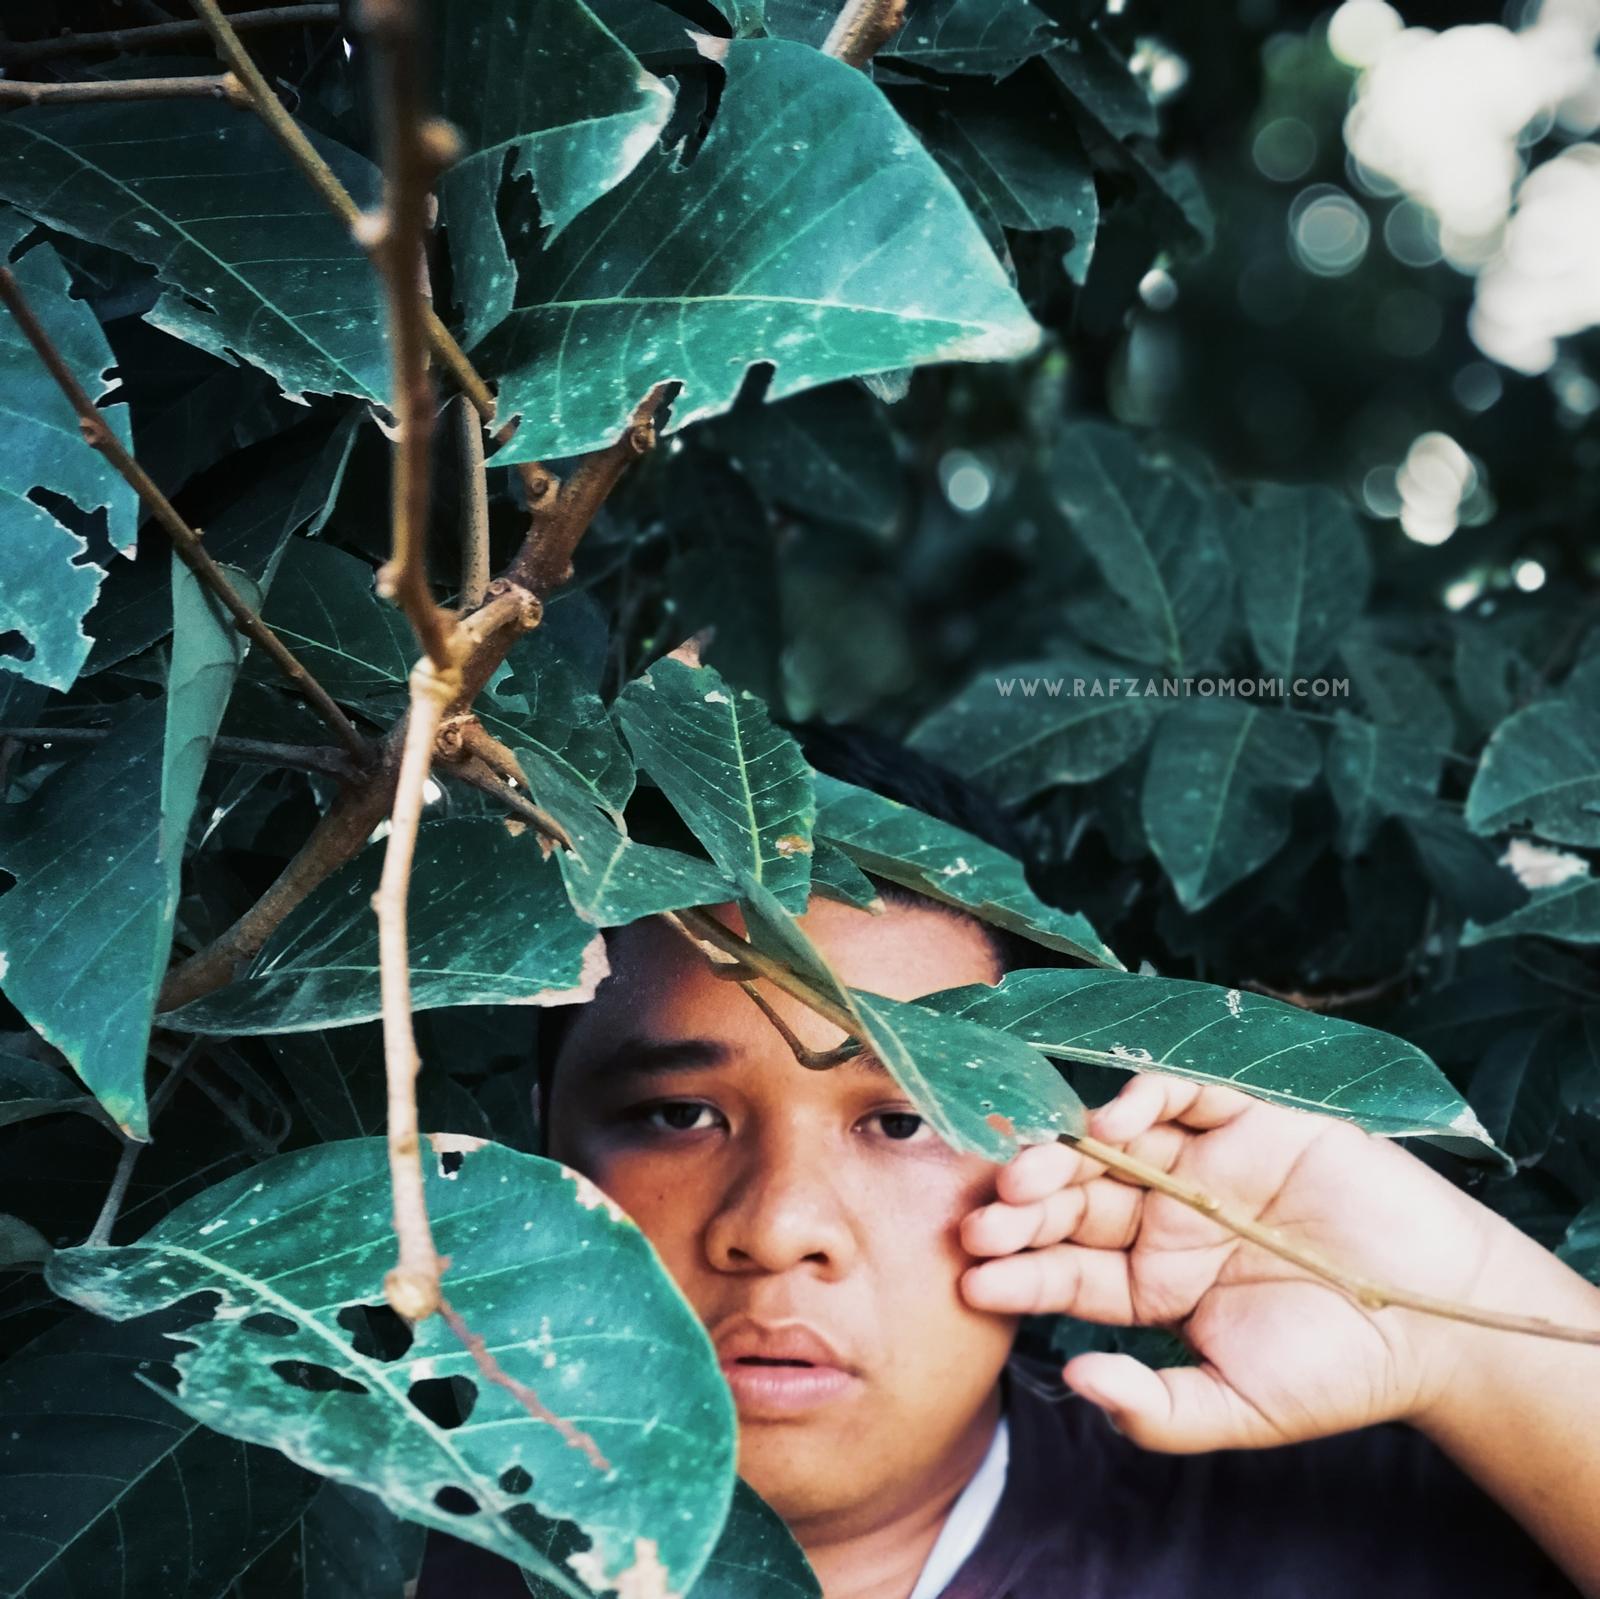 Saya & Gambar IV -Edisi Balik Kampung- Rafzan Tomomi